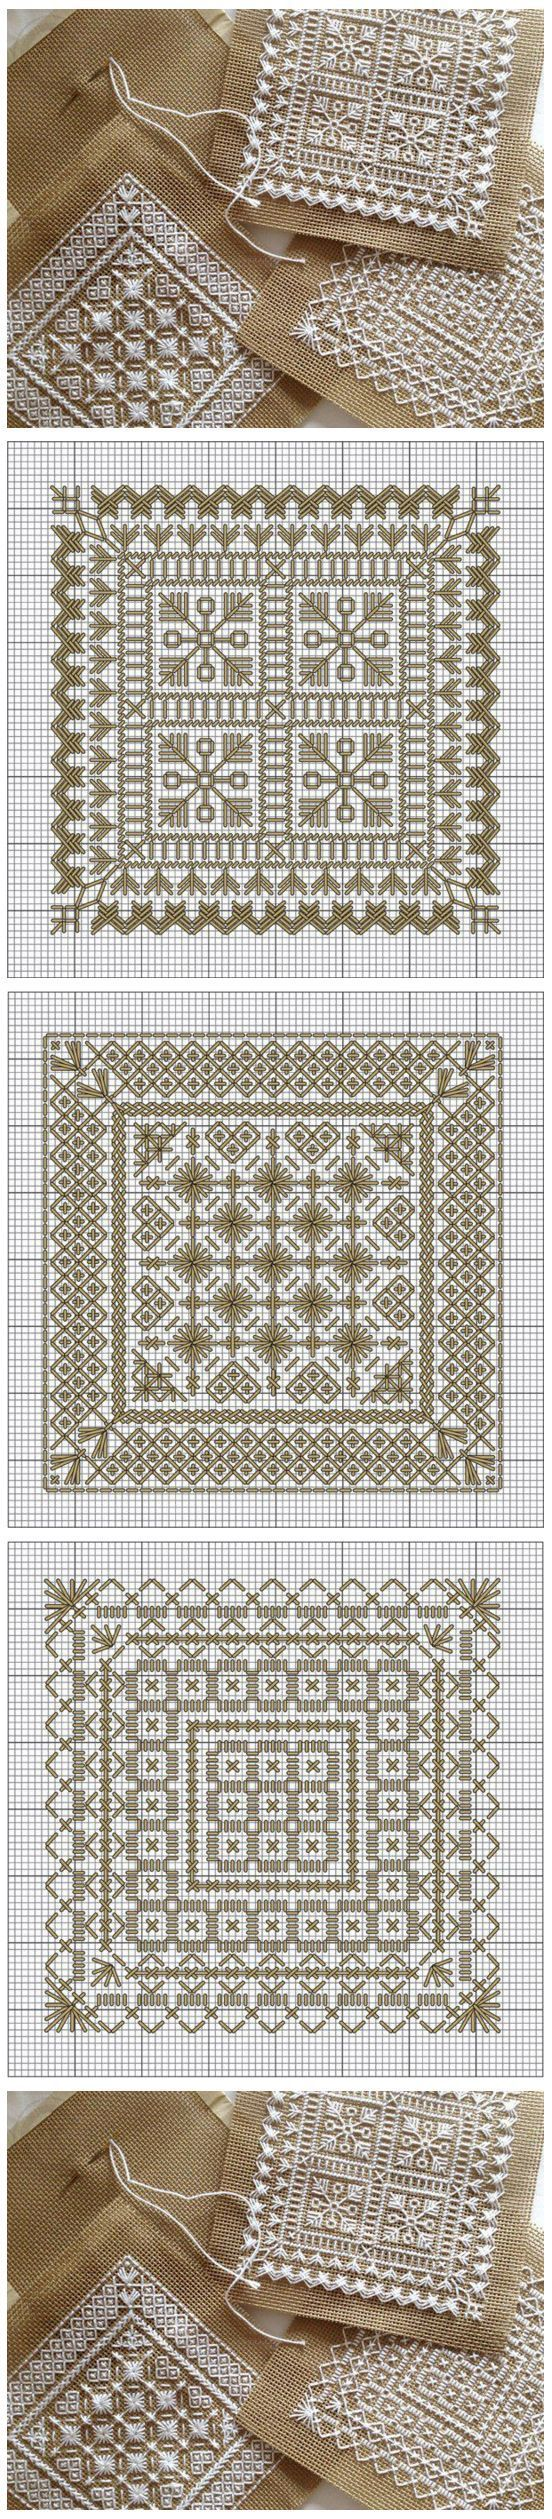 3dd60efbd7be4e91213c74048ec28bcf.jpg 552×2,519 pixels